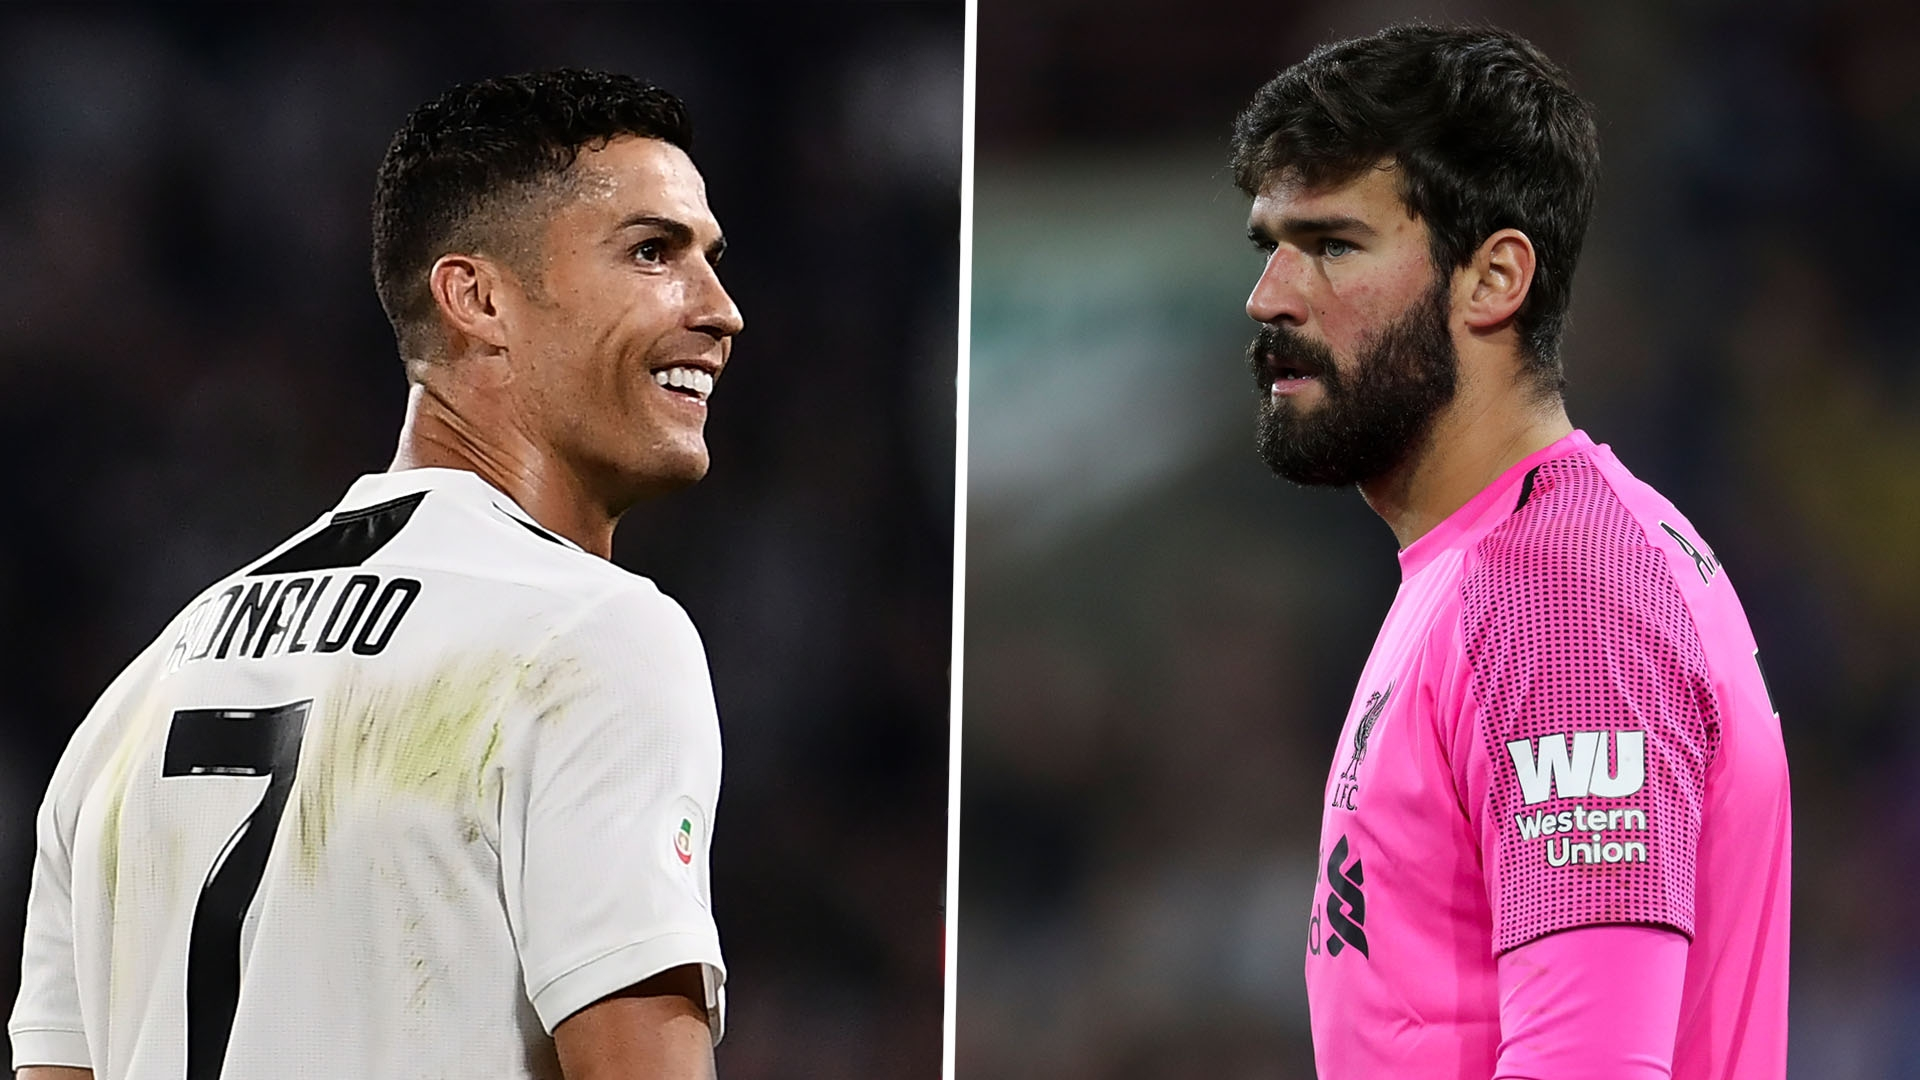 Ronaldo-alisson_1w4zsk5ibken91nn2o62l5qj7d